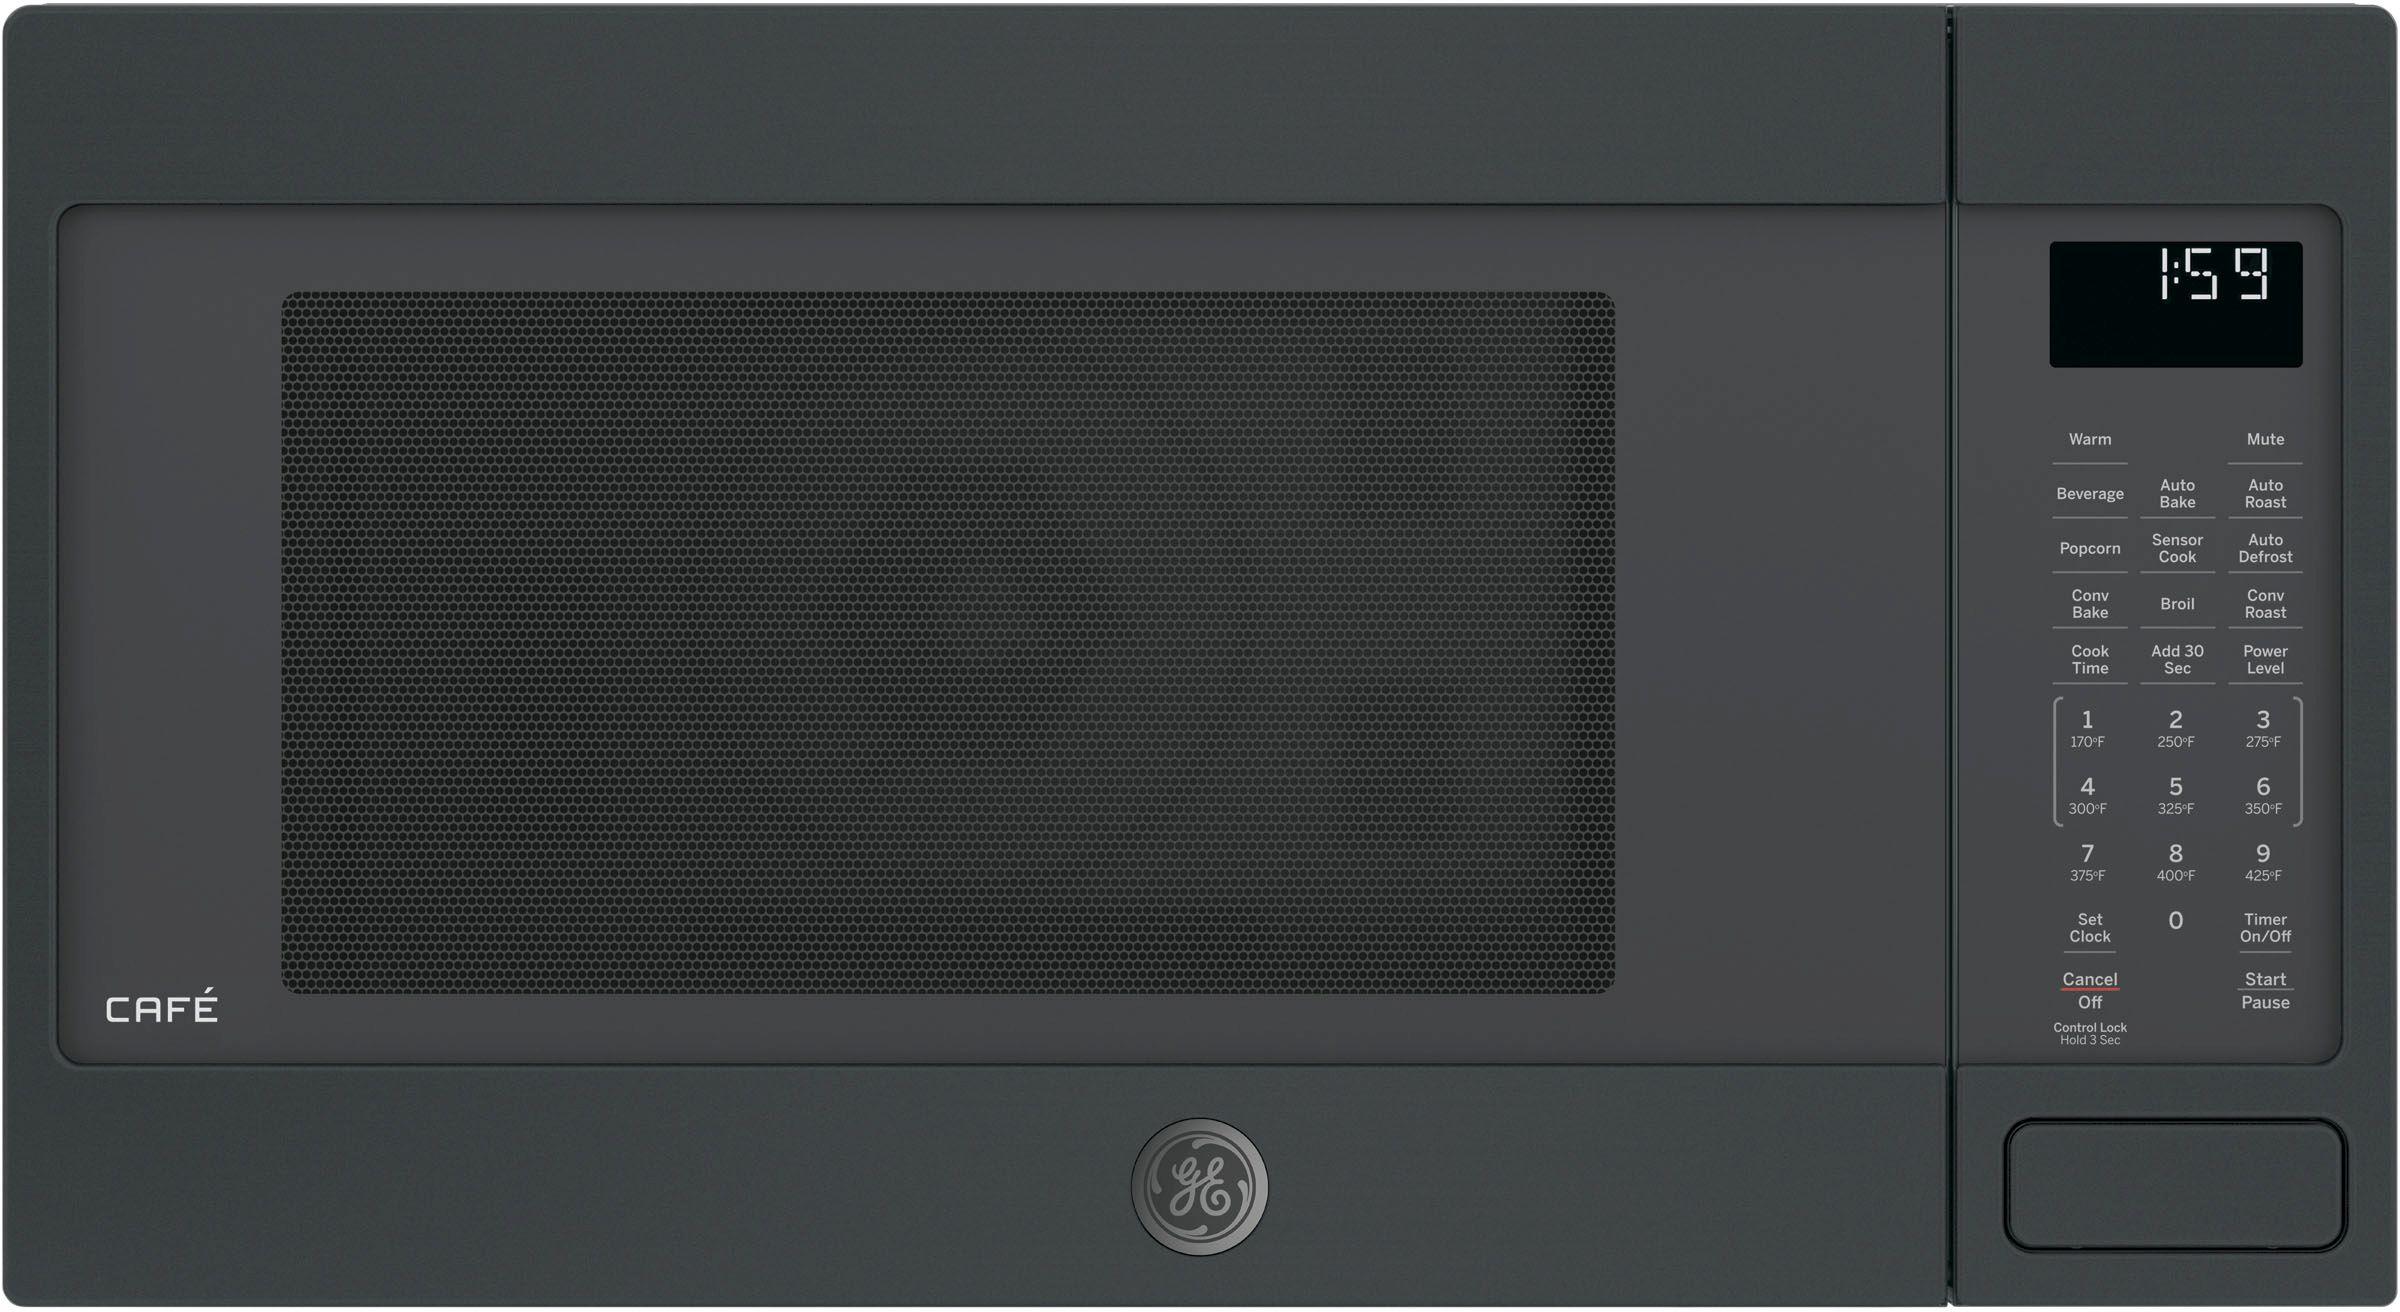 countertop set appliance convection countertops flicks watt kitchenaid microwave ovens tv oven